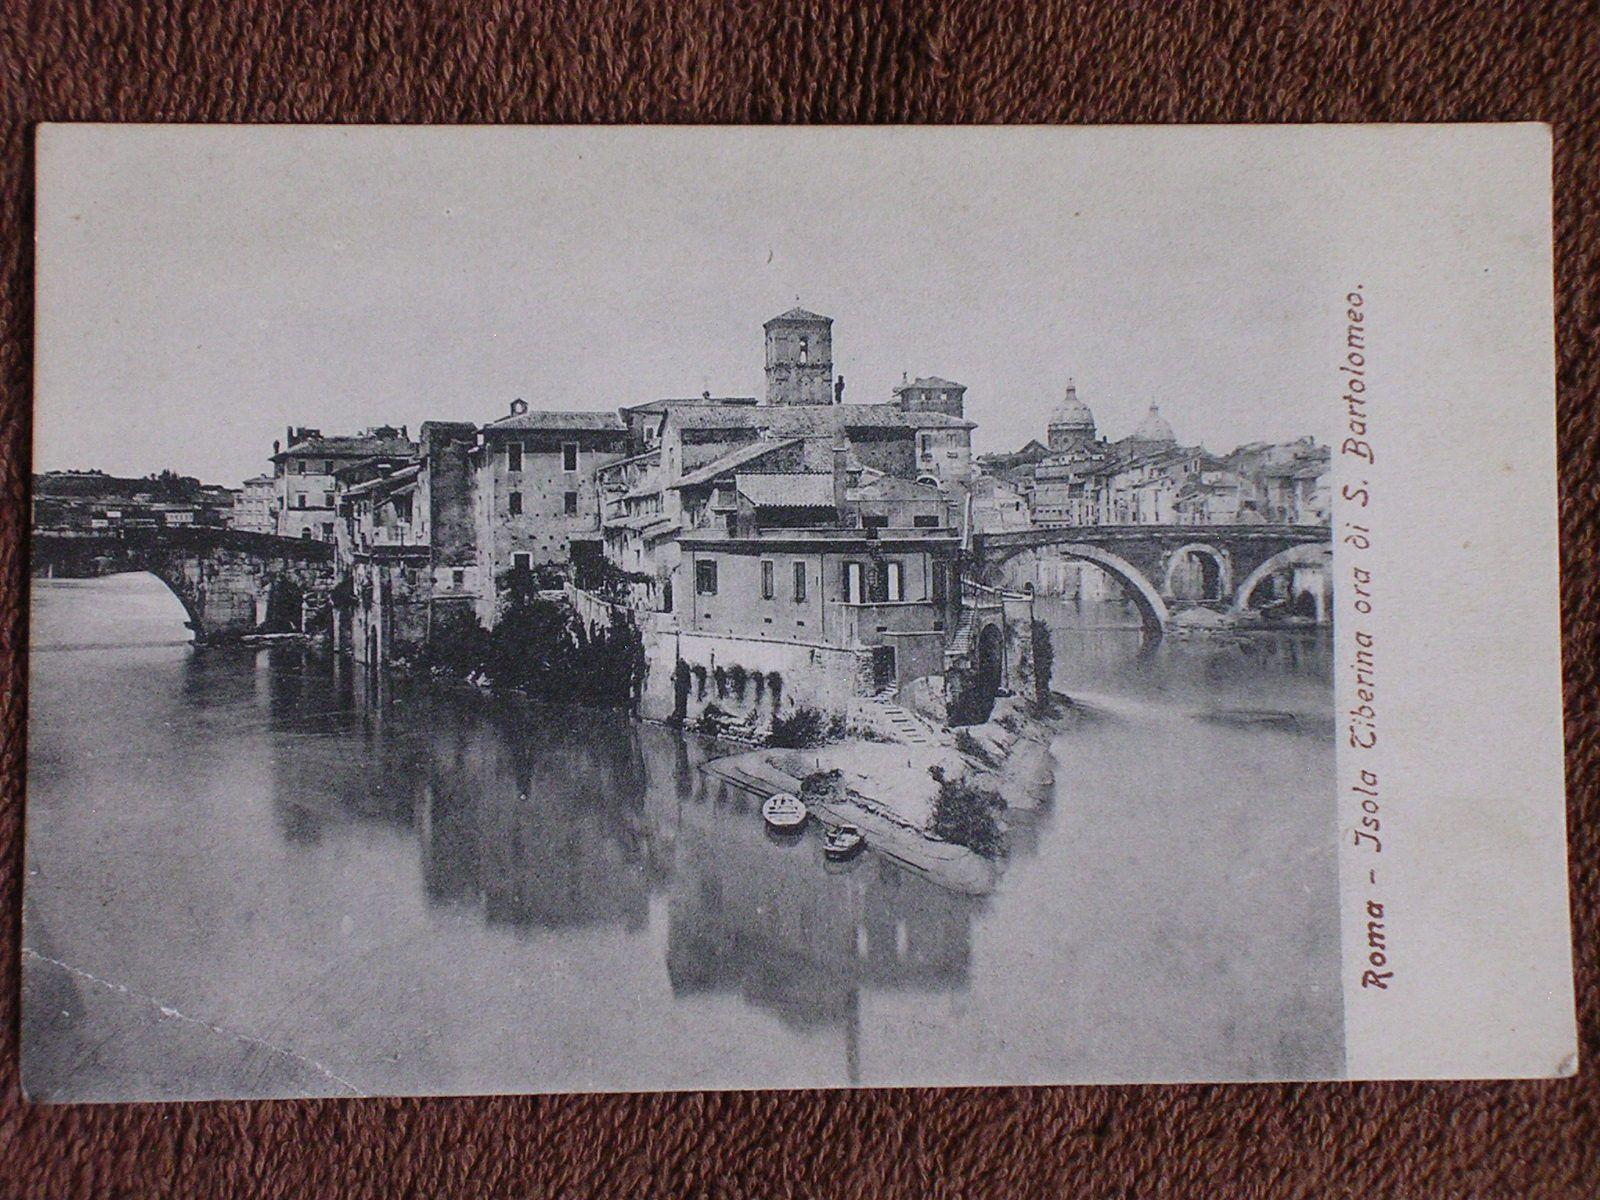 Roma Rome Italy Isola Tiberina Ora Di s Bartolomeo Printed Photo Postcard   eBay